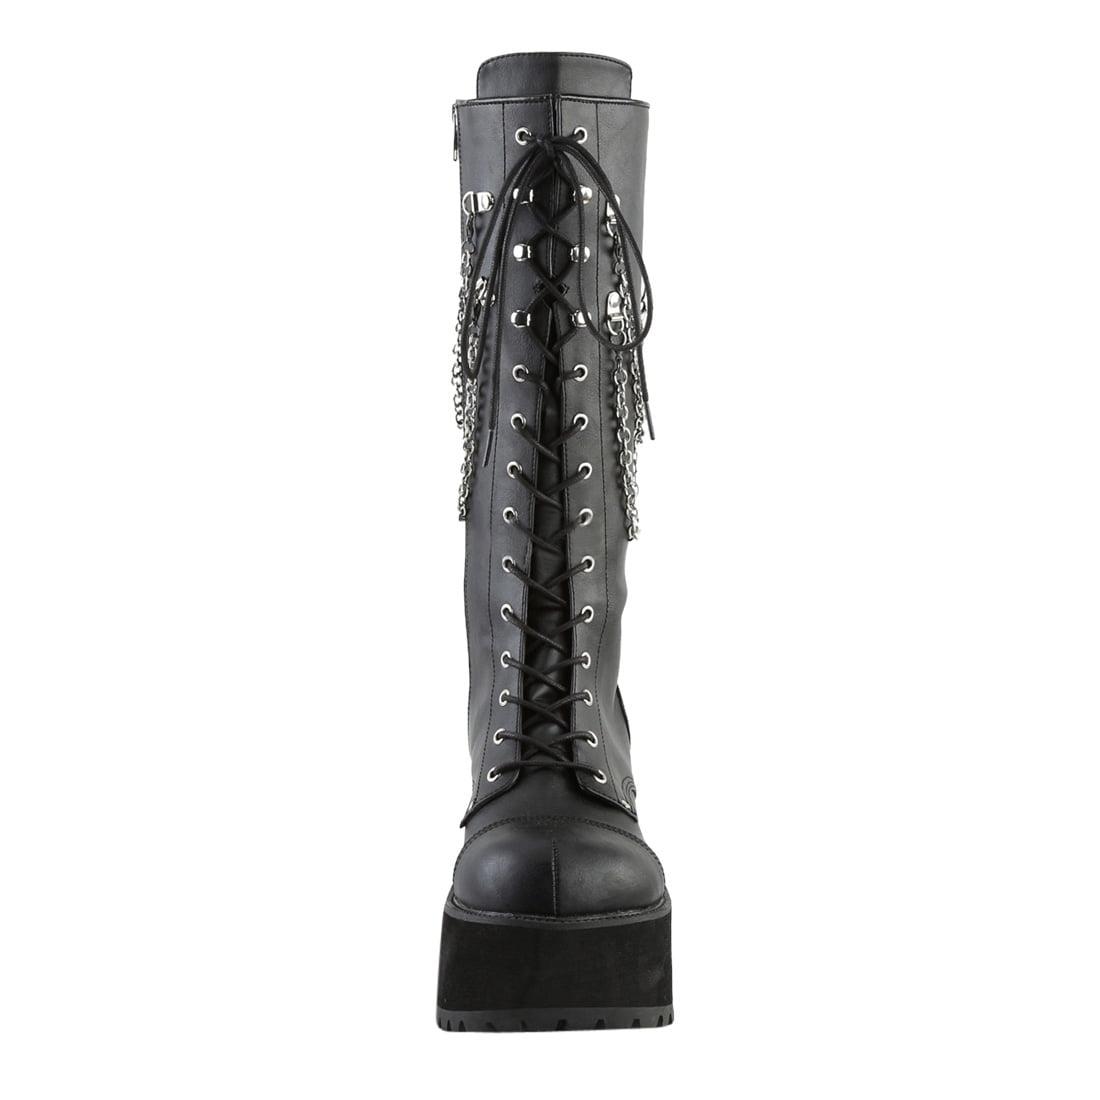 Men's Demonia Ranger 303 Platform Lace-Up Boot